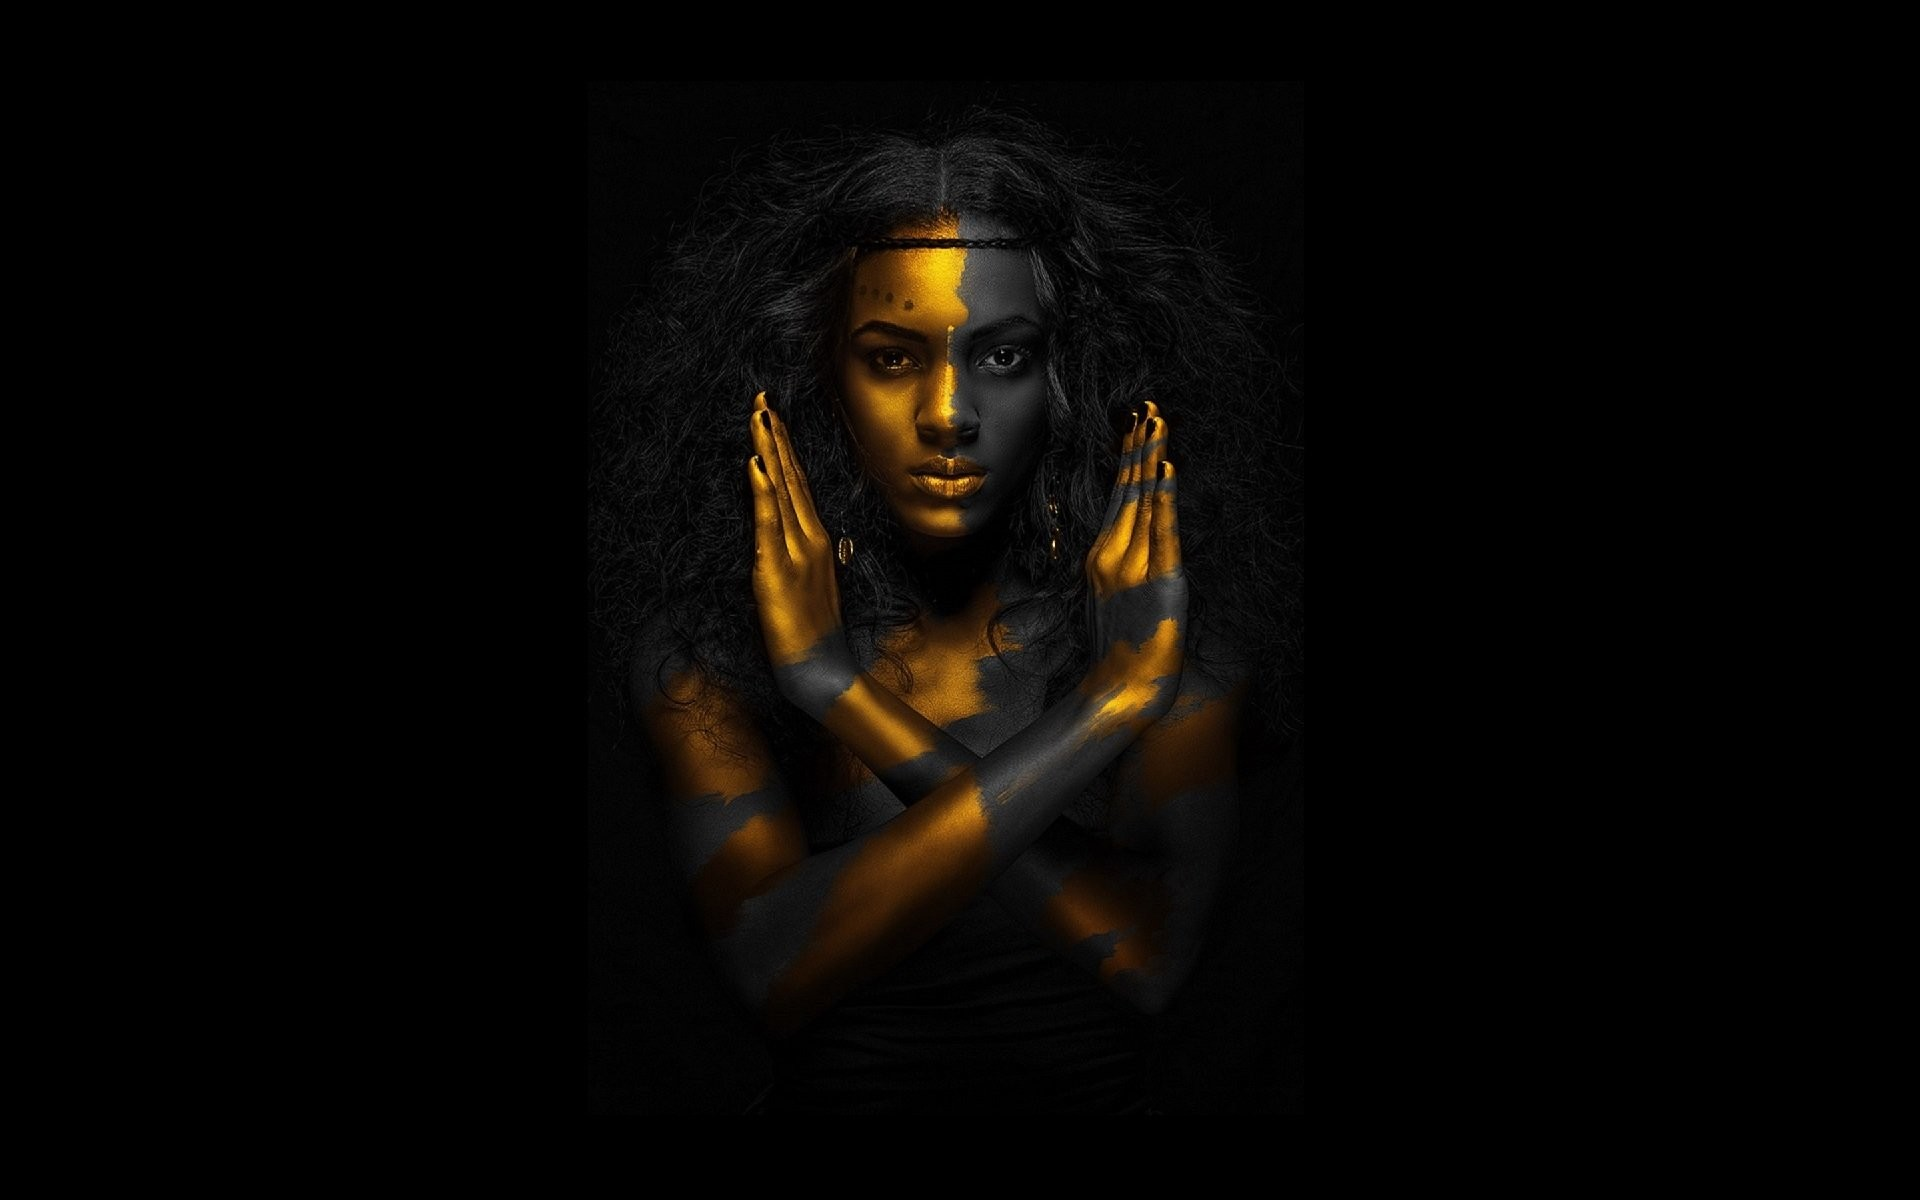 Egyptian qeen gold black woman resolution wallpaper